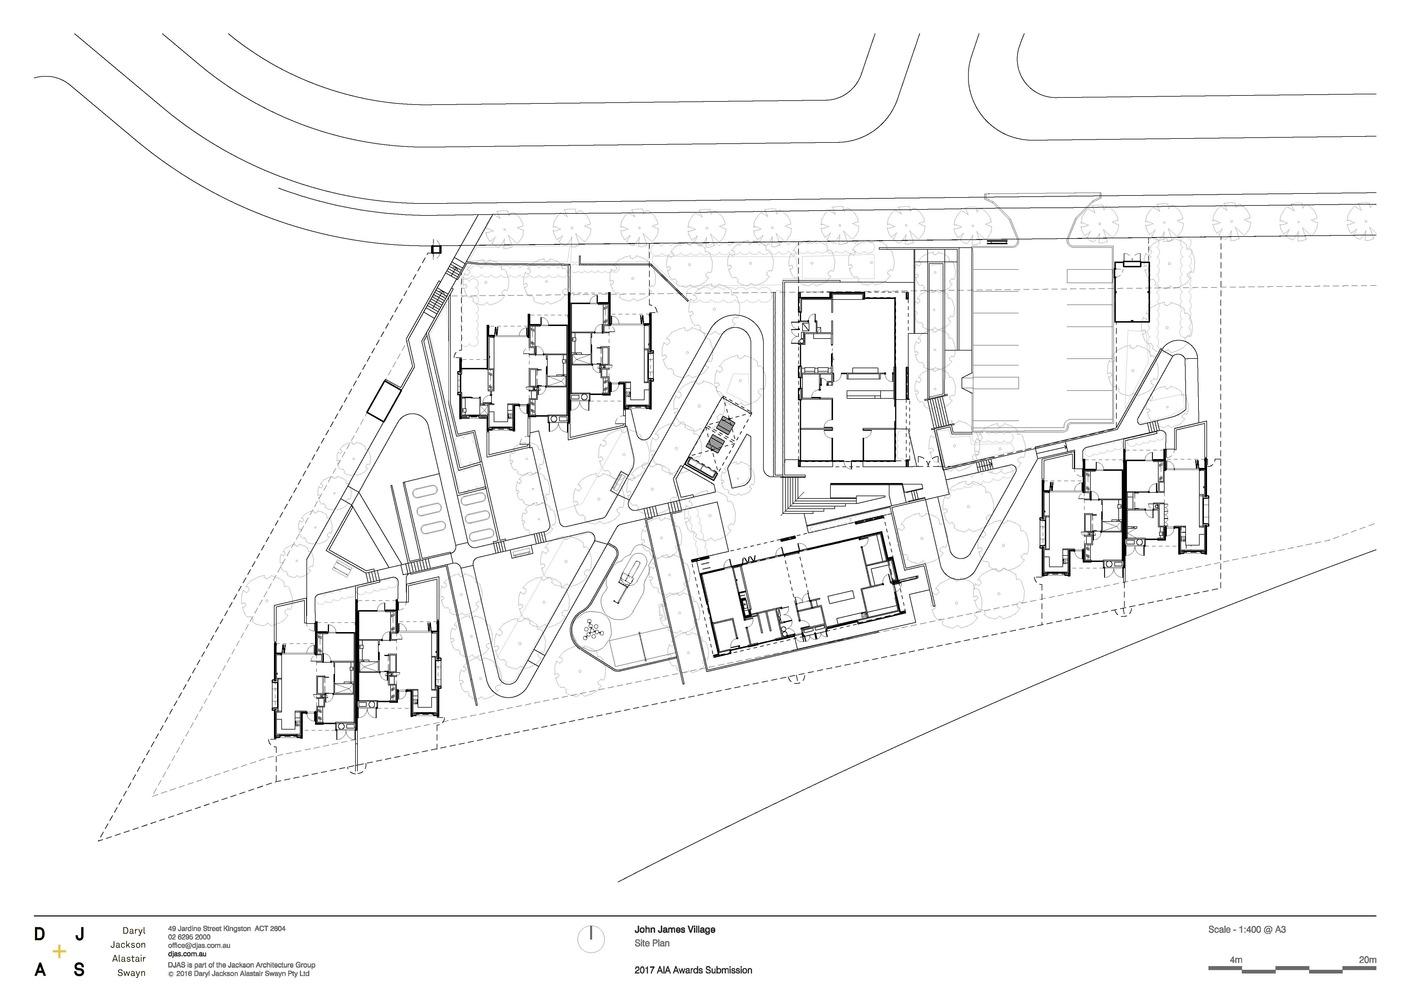 1410x1000 Gallery Of John James Village Djas Architects